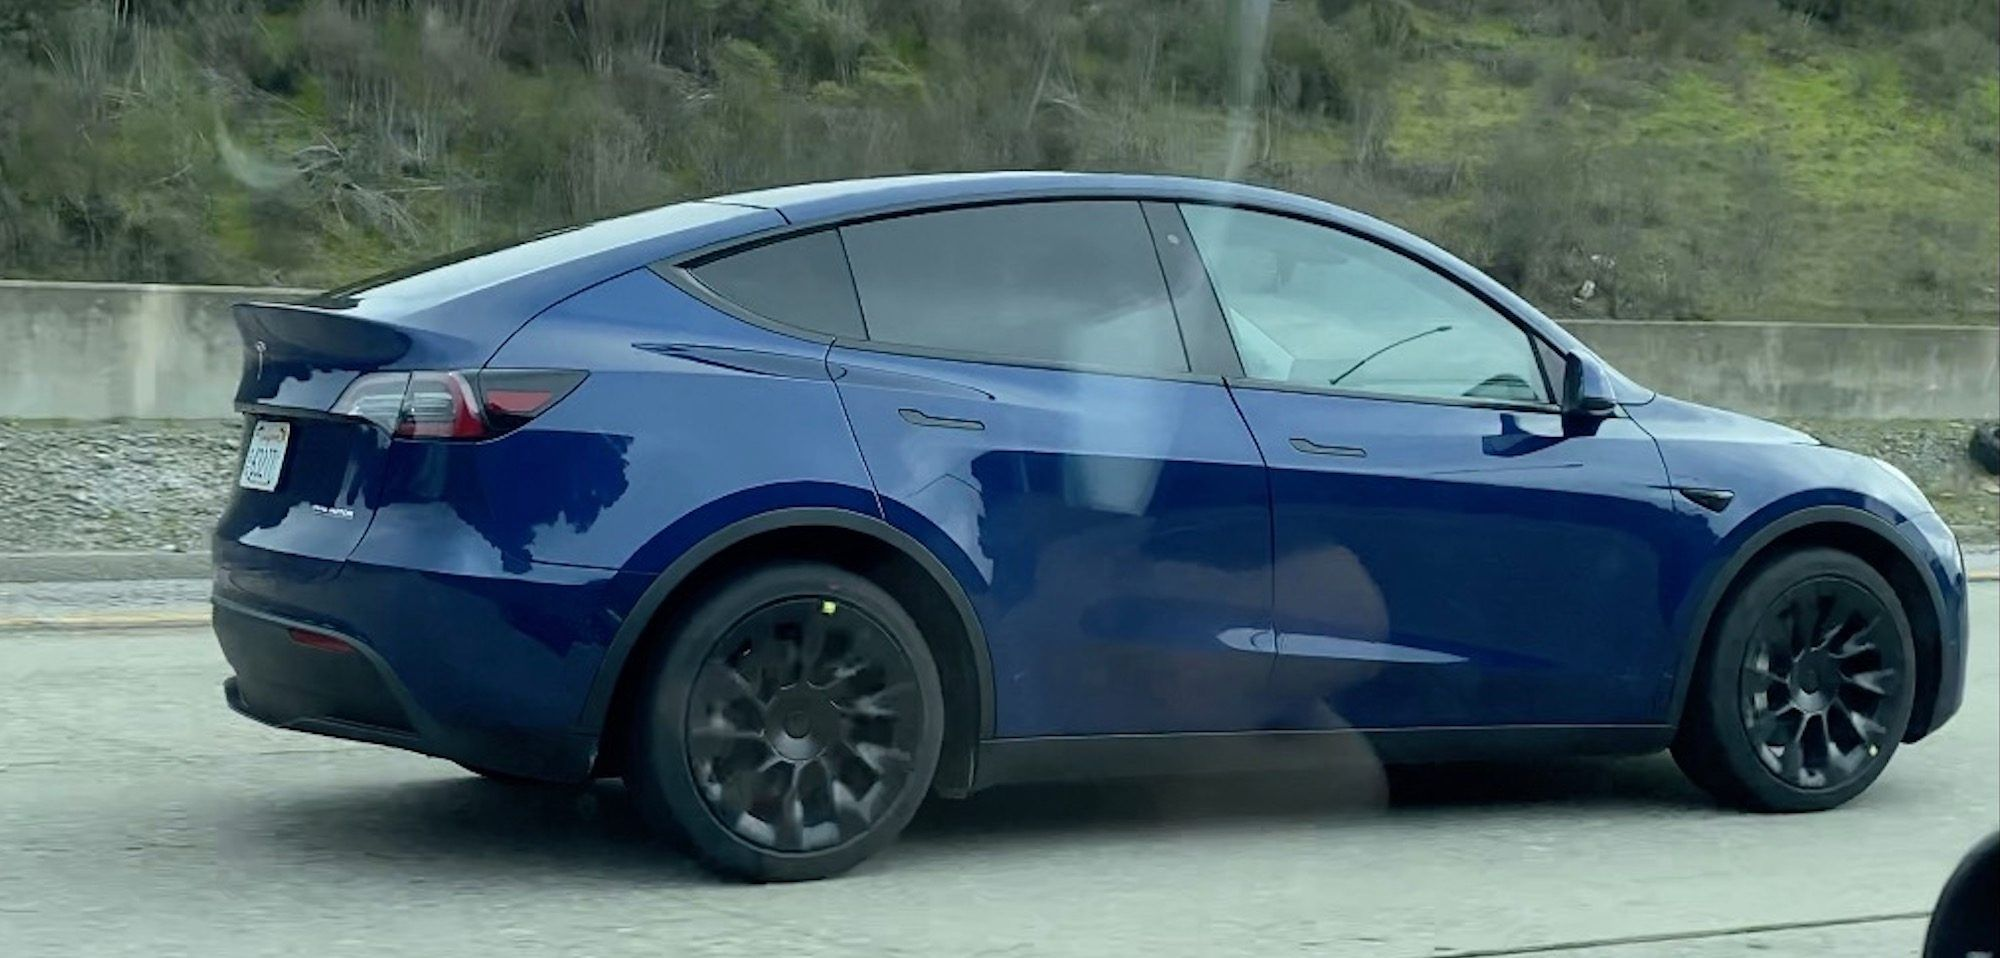 Tesla Model Y Prototype Spotted Along With New Wheels Electrek